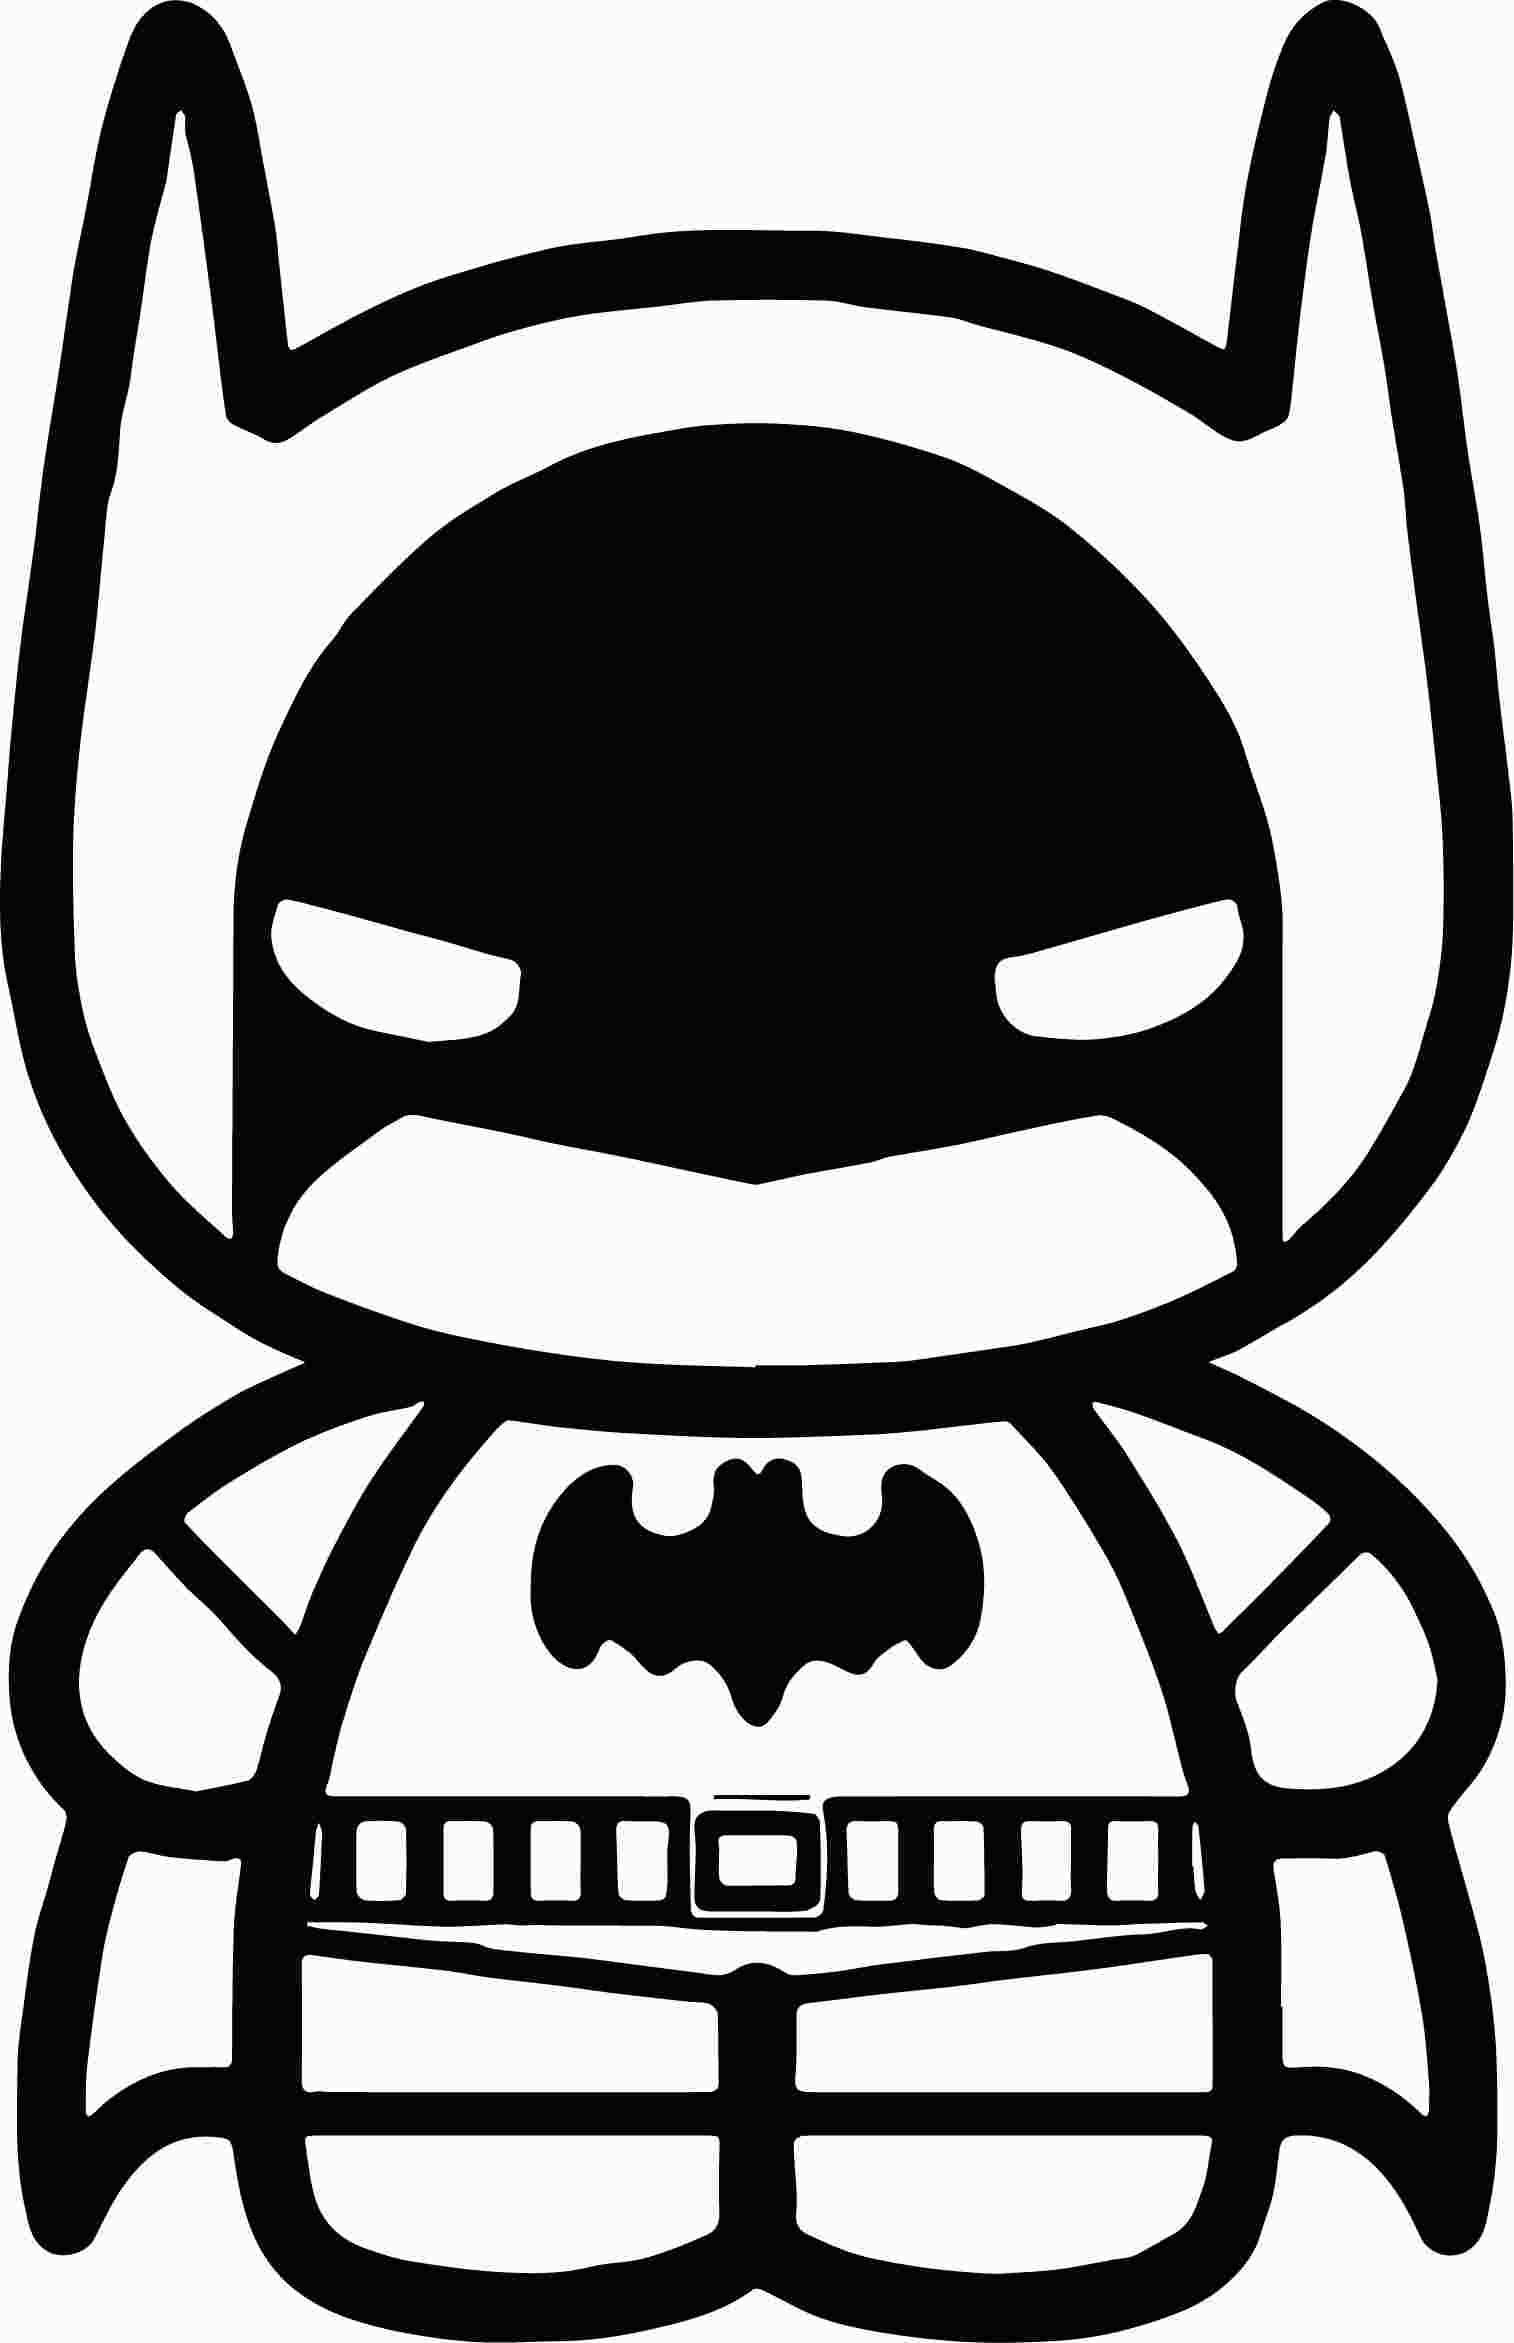 Cute Joker Coloring Pages Batman Coloring Pages Chibi Coloring Pages Cute Batman